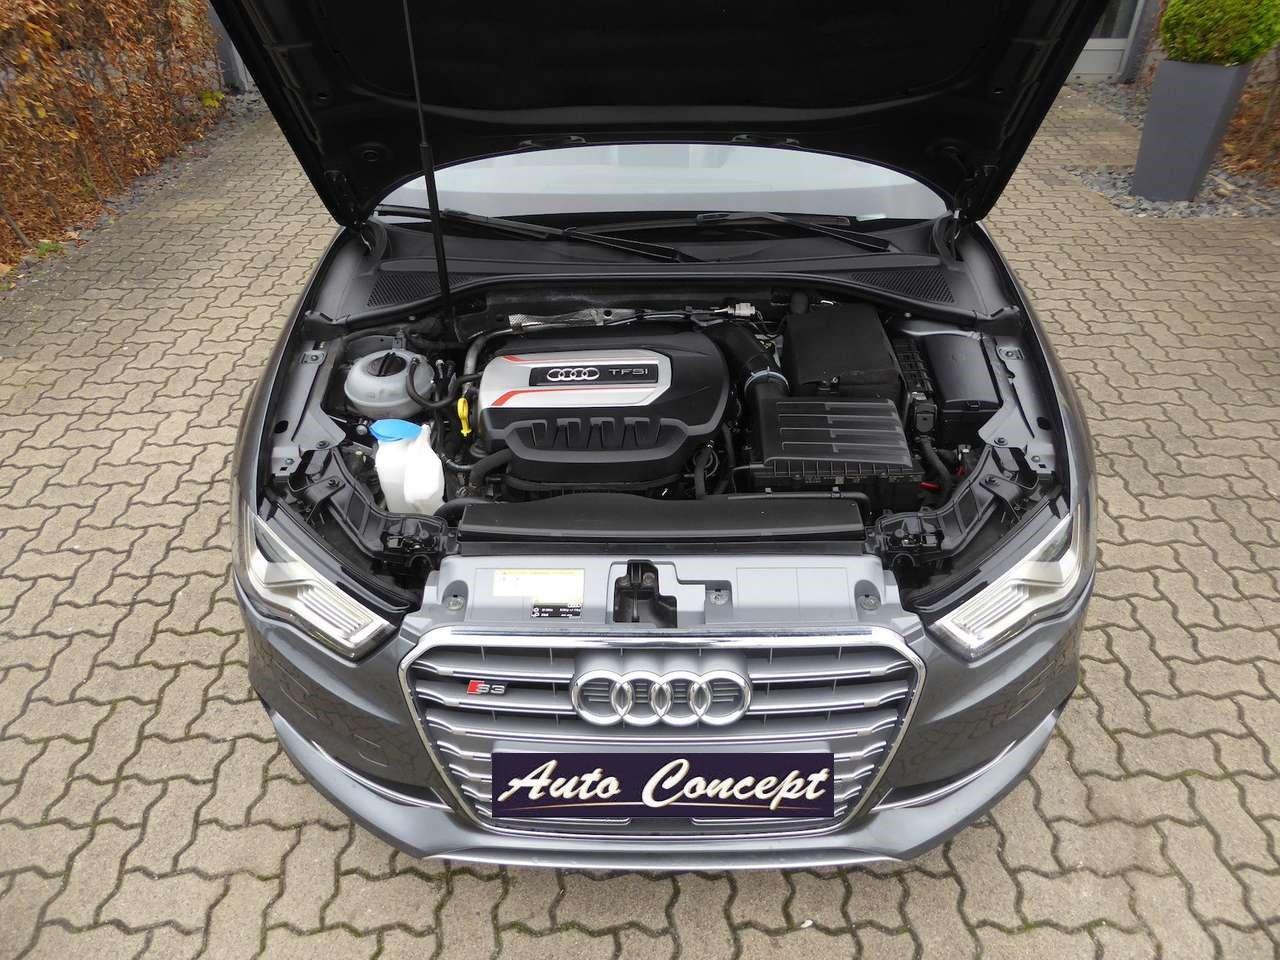 Audi S3 Cabriolet III 2 0 TFSI 300ch quattro